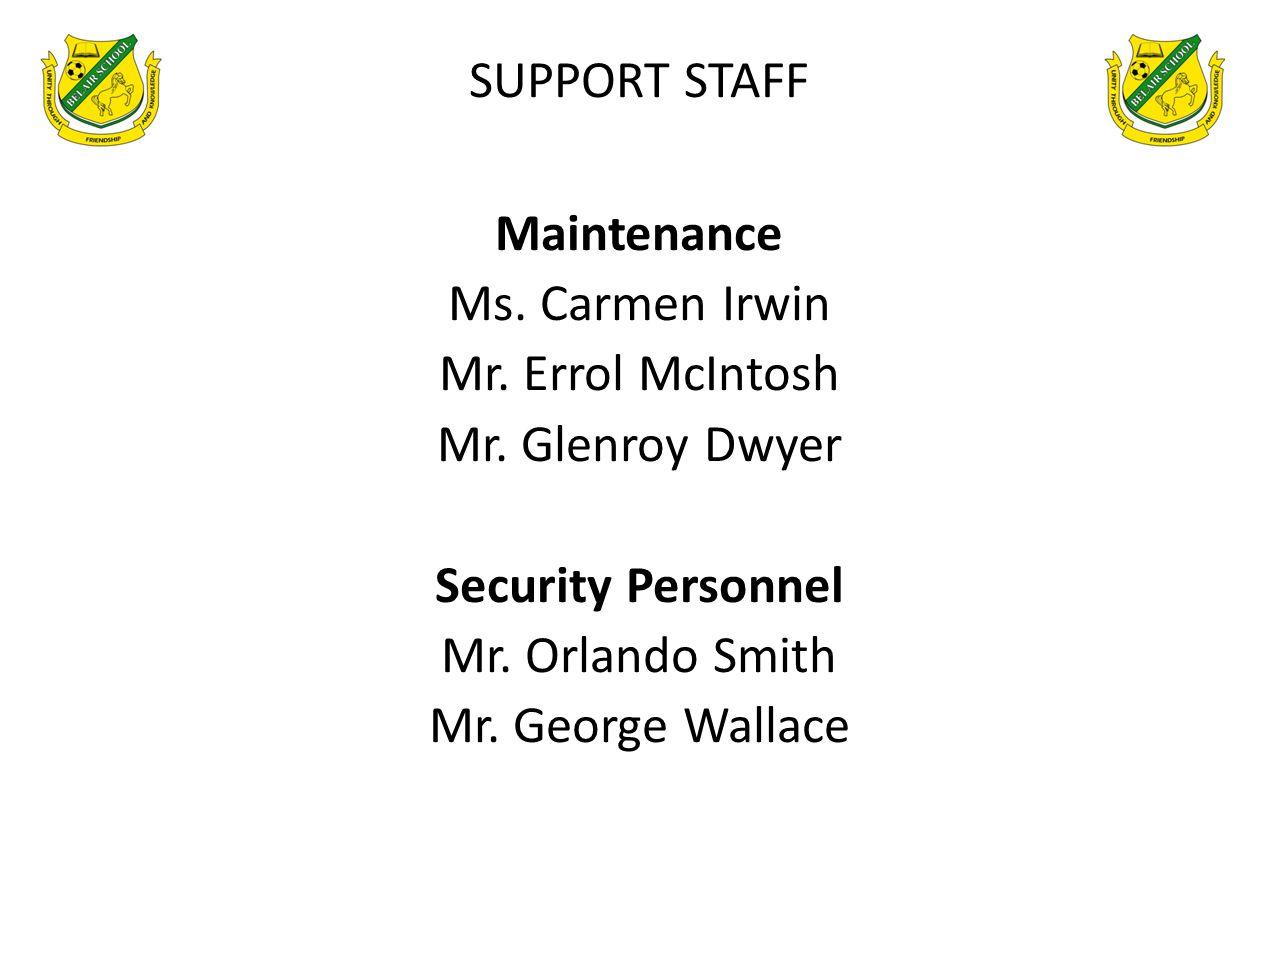 SUPPORT STAFF Maintenance Ms. Carmen Irwin Mr. Errol McIntosh Mr. Glenroy Dwyer Security Personnel Mr. Orlando Smith Mr. George Wallace